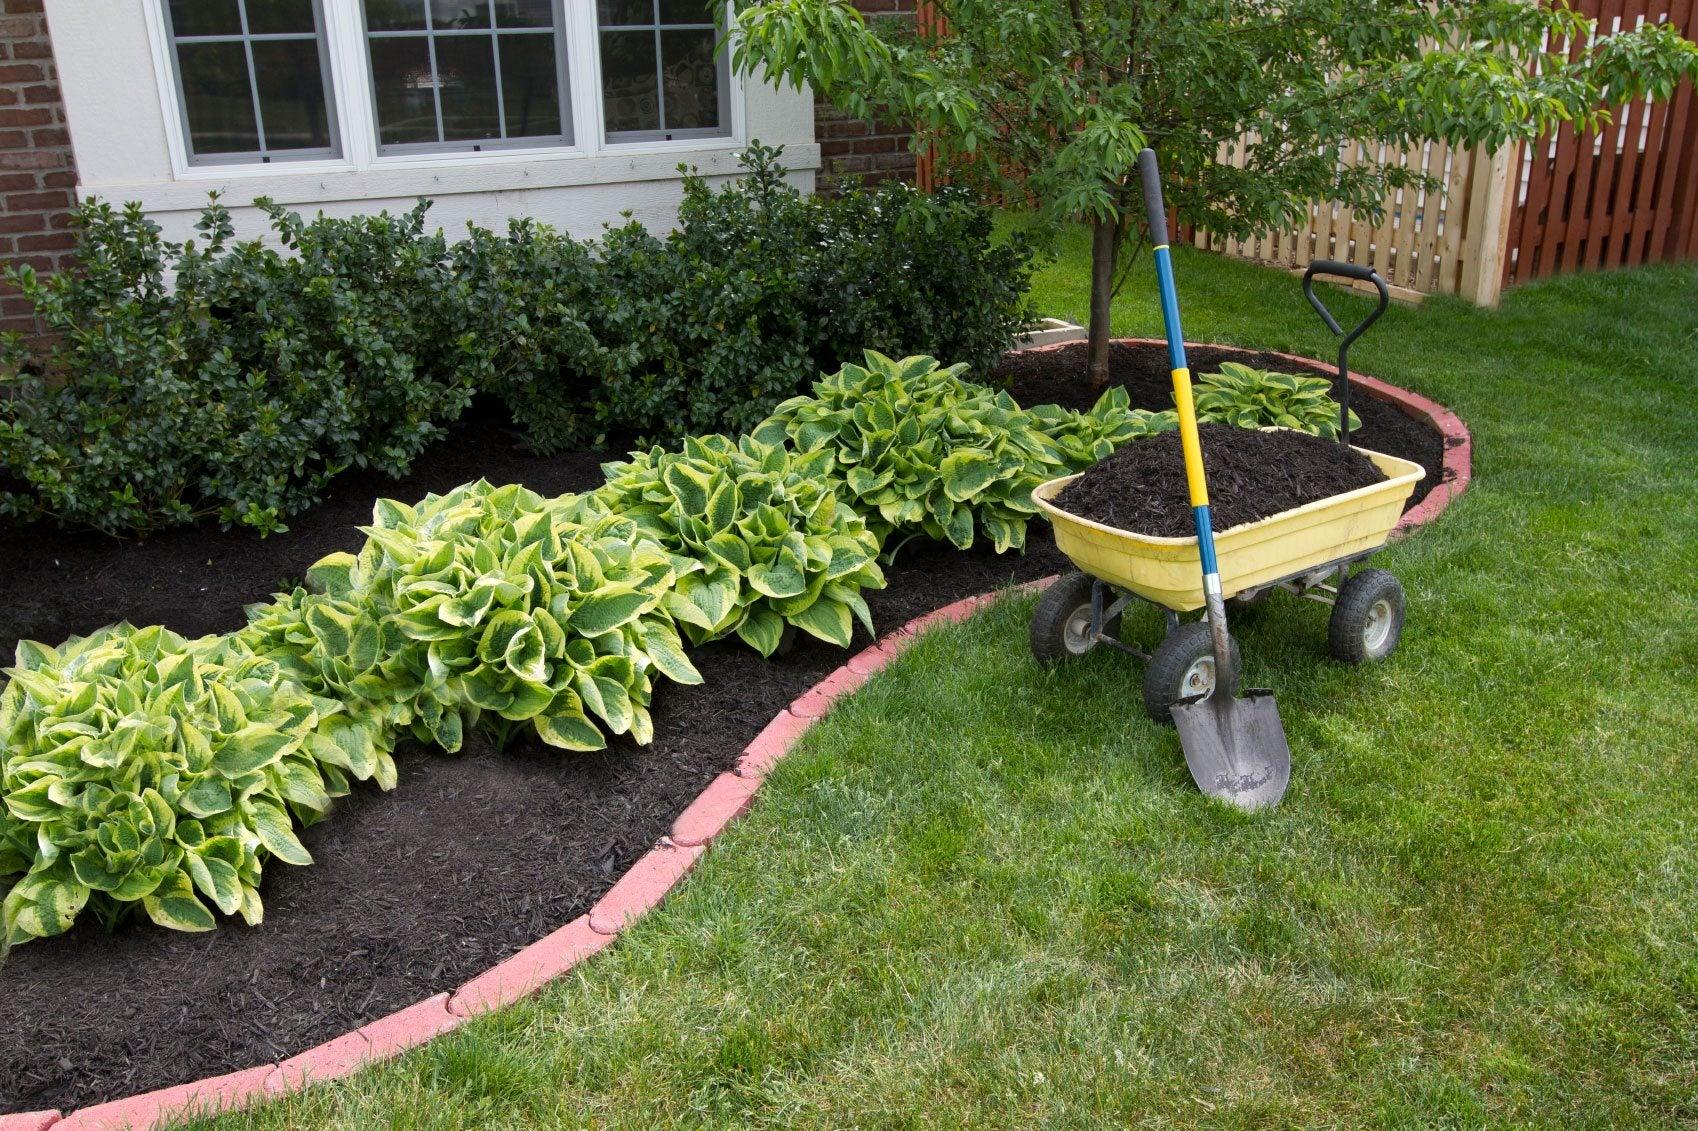 http://www.gardeningknowhow.com/wp-content/uploads/2014/06/garden-mulch.jpg